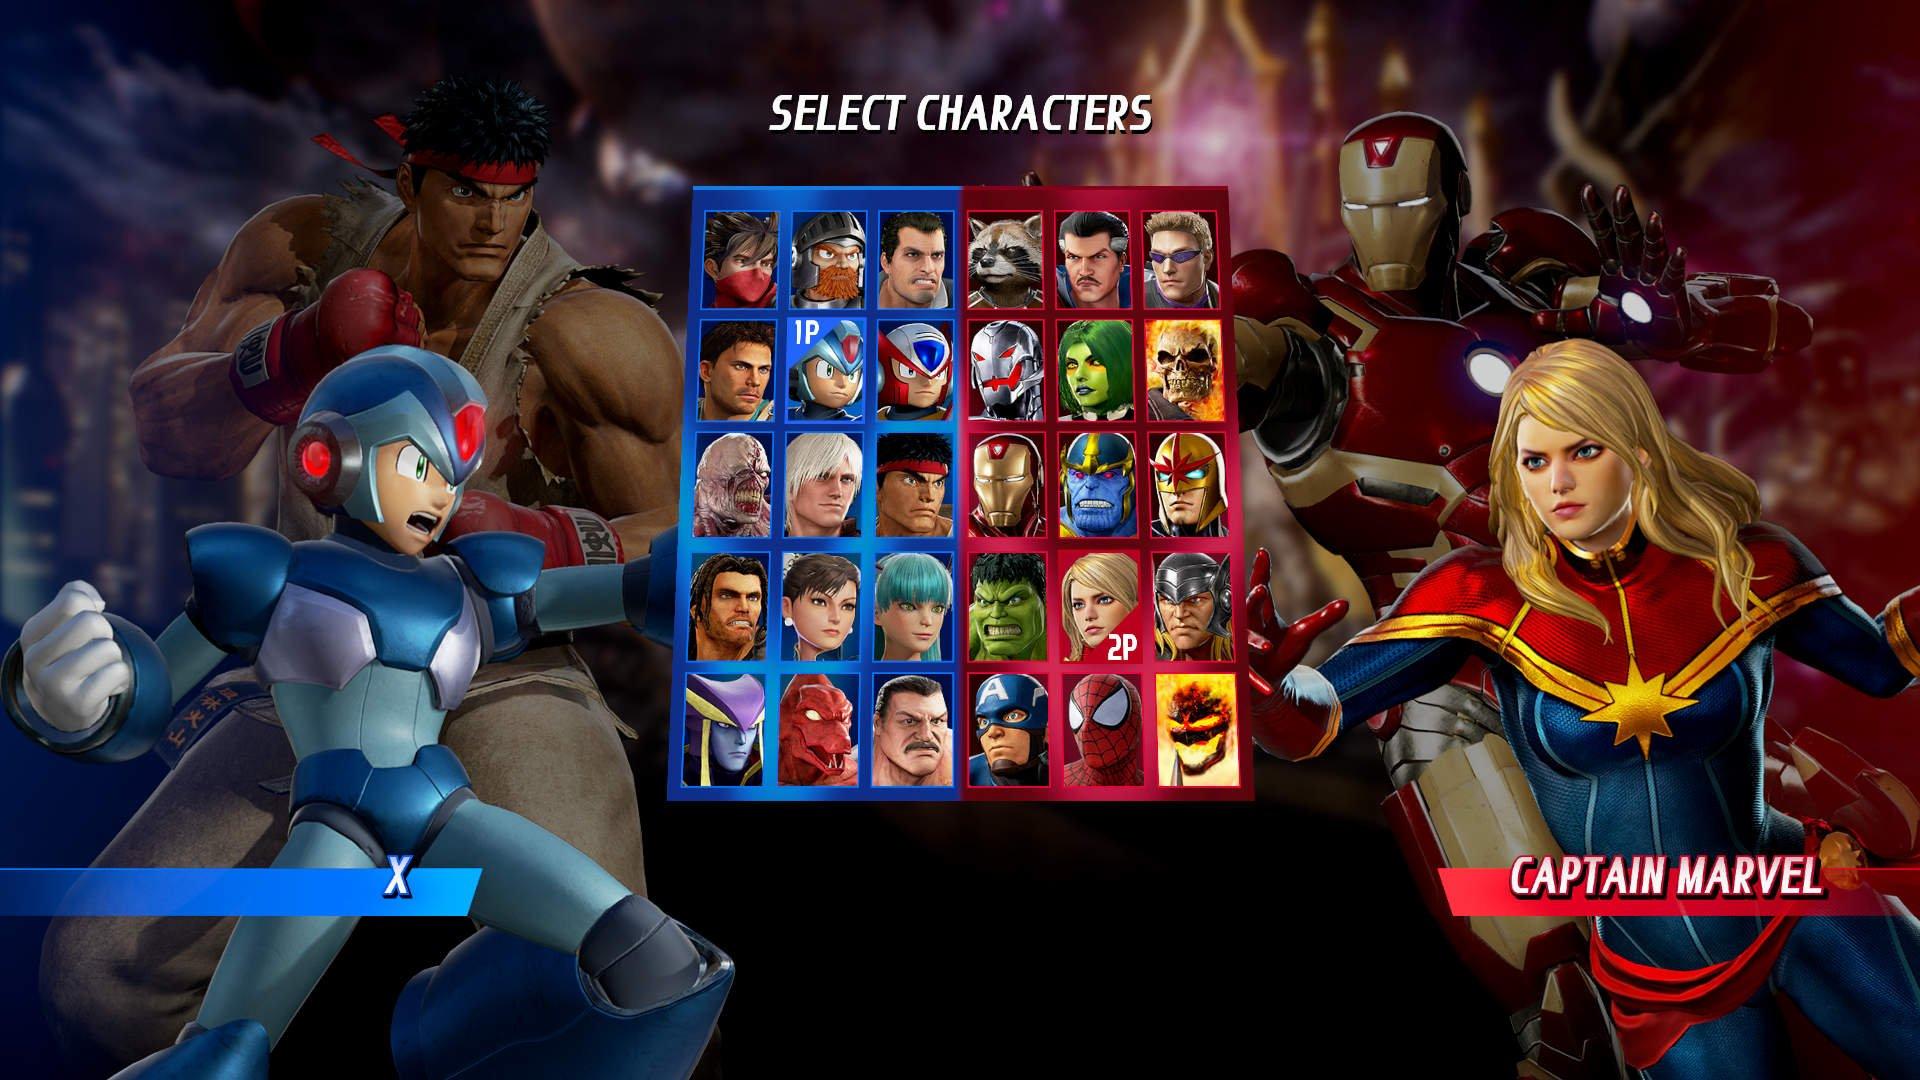 Скриншот к игре Marvel vs. Capcom: Infinite - Deluxe Edition (2017) скачать торрент RePack от xatab